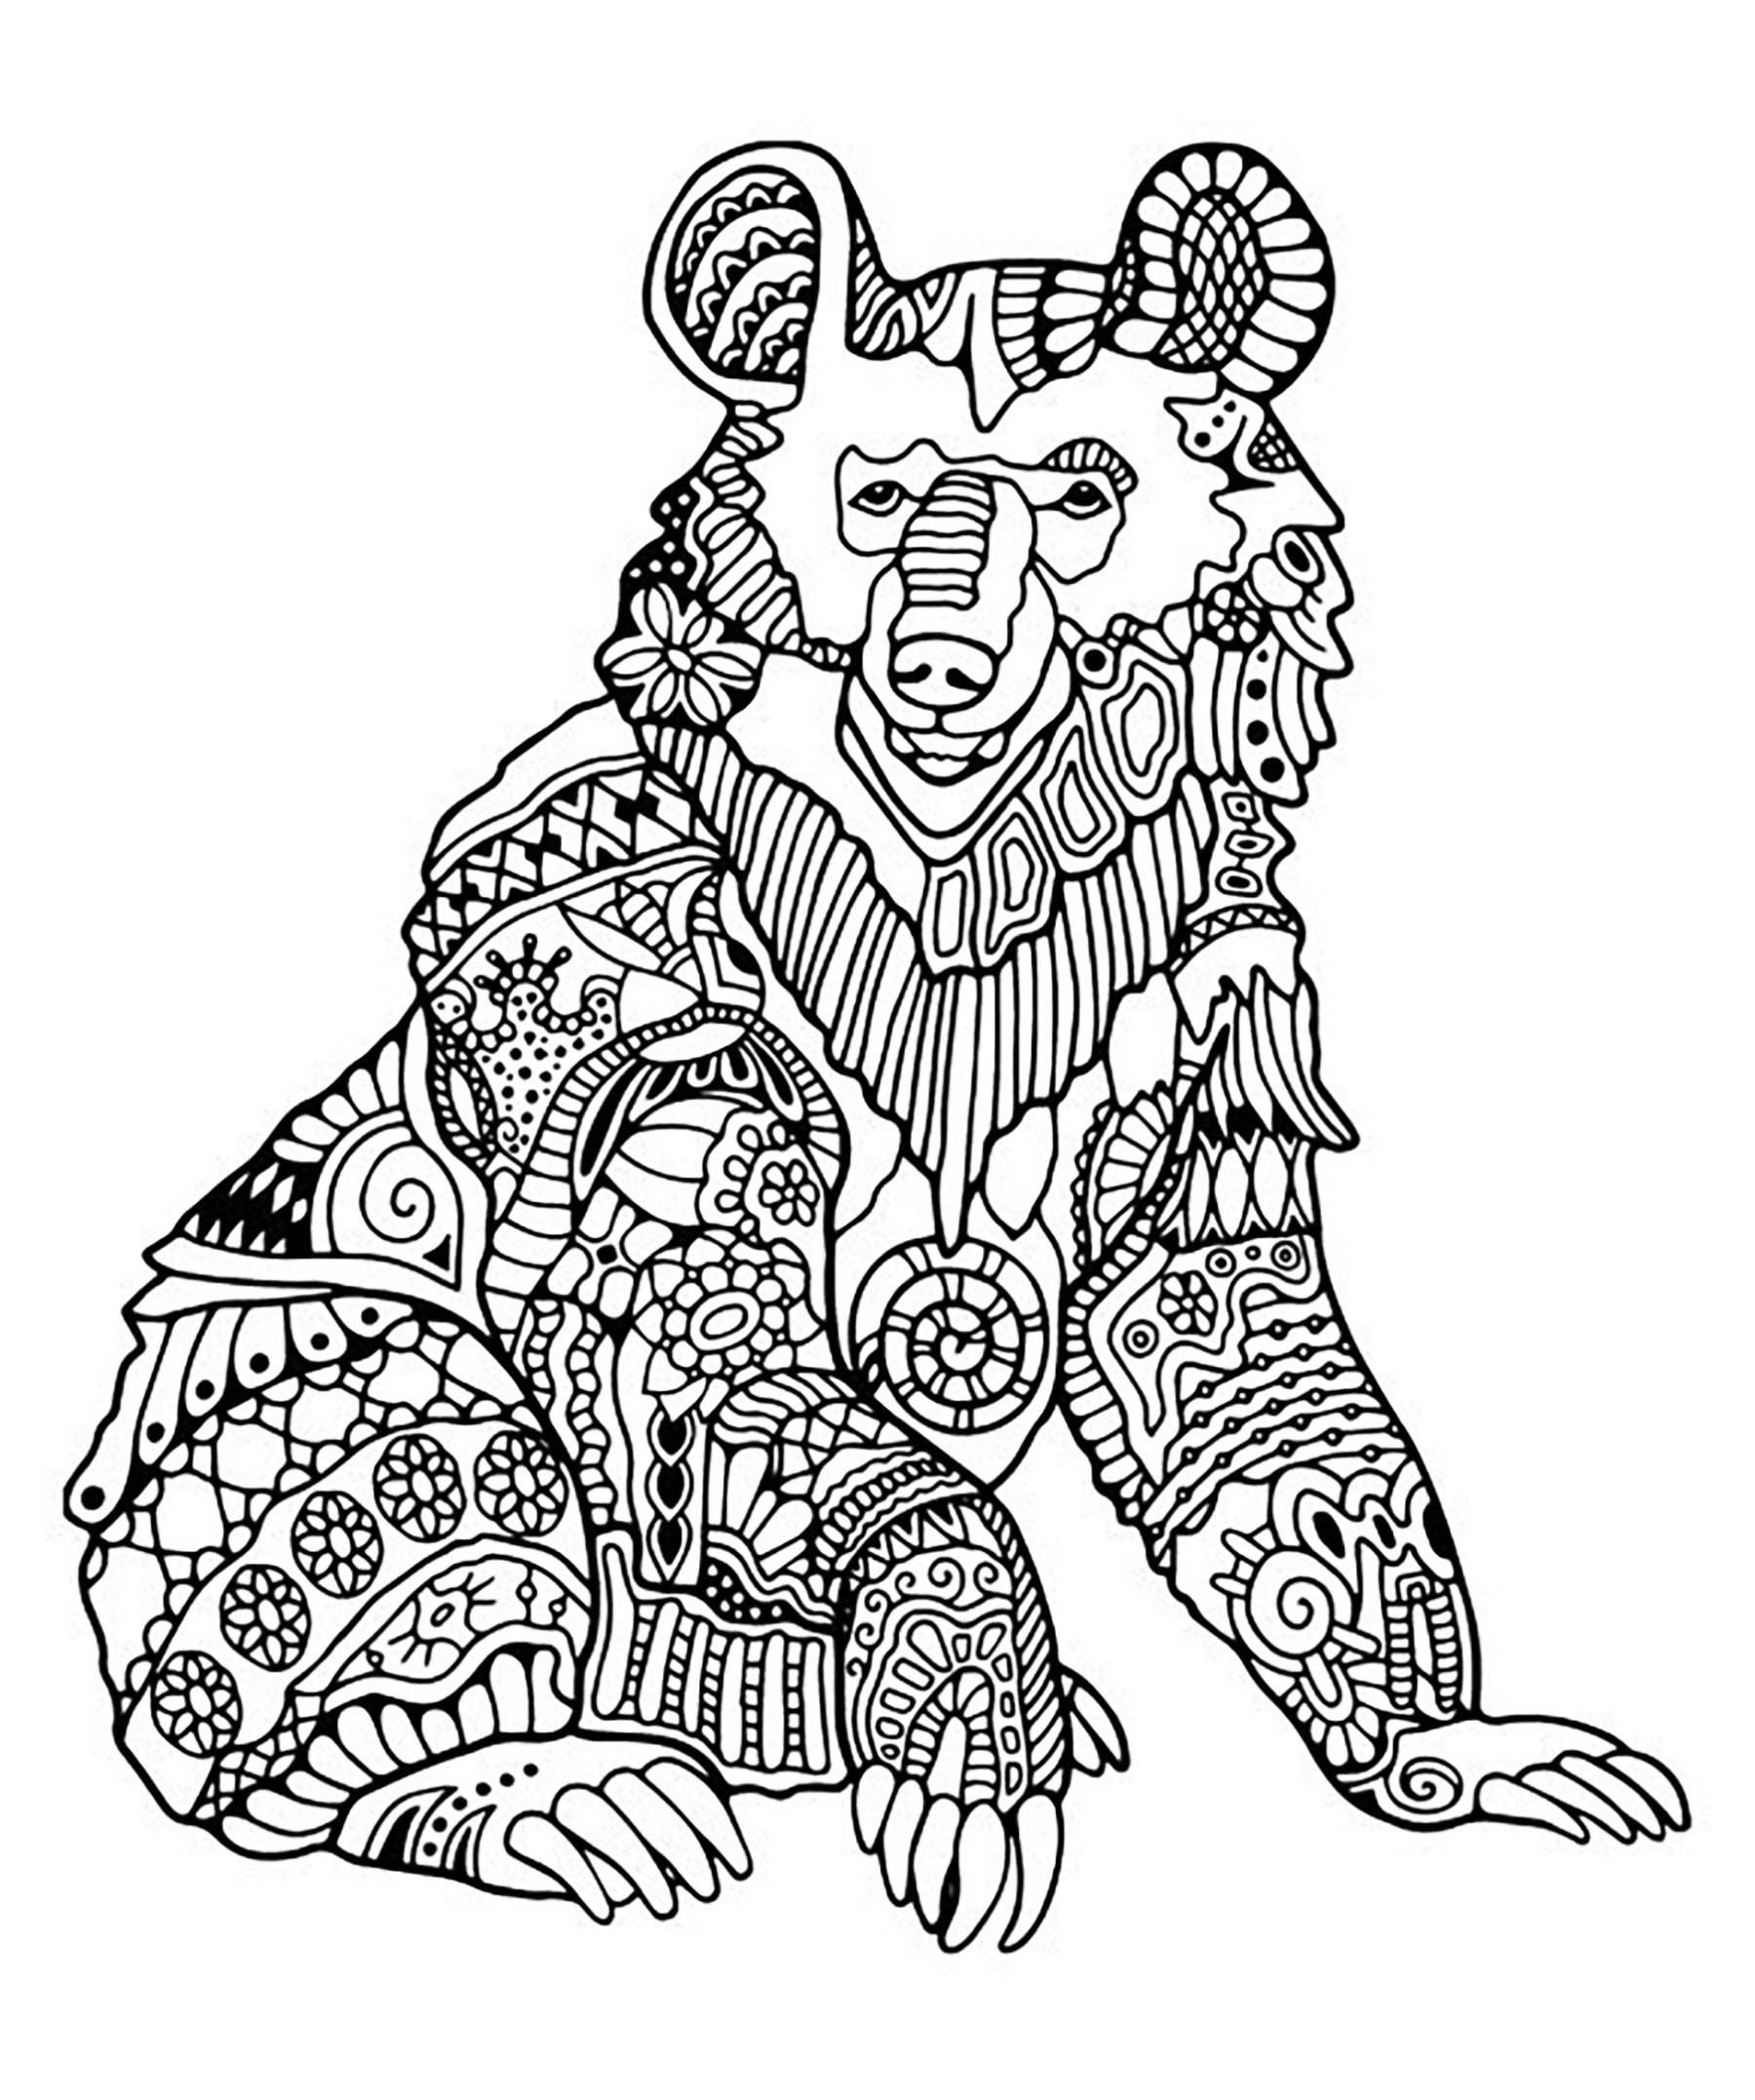 Baren 93675 - Bären - Malbuch Fur Erwachsene